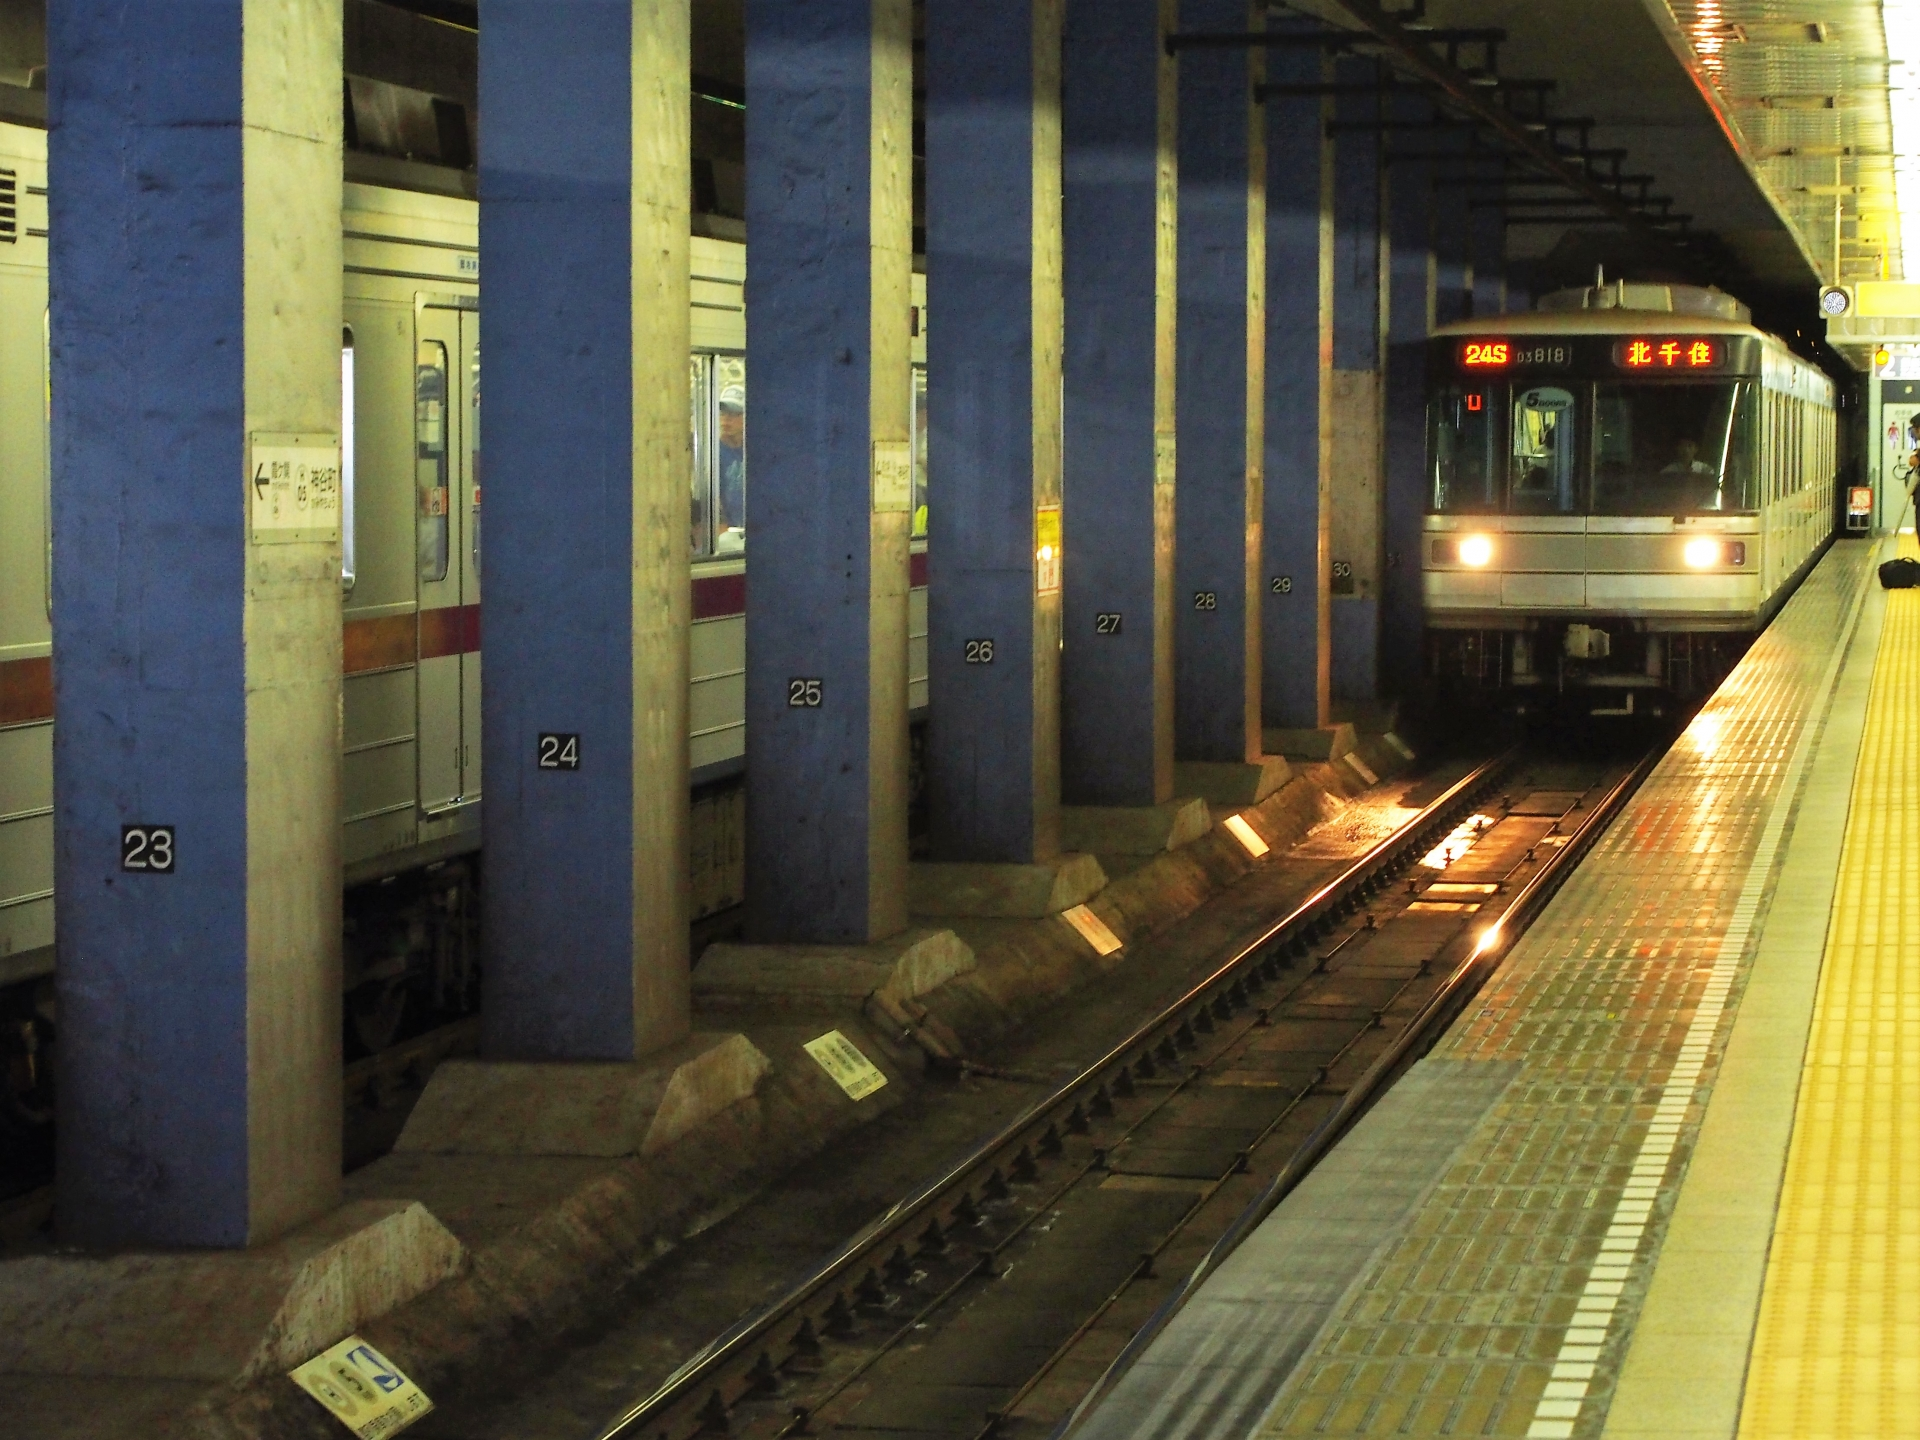 03079c06083767abeaab0954de7e7137 m 地下鉄サリン事件に見る、経費毒の恐ろしさとは?